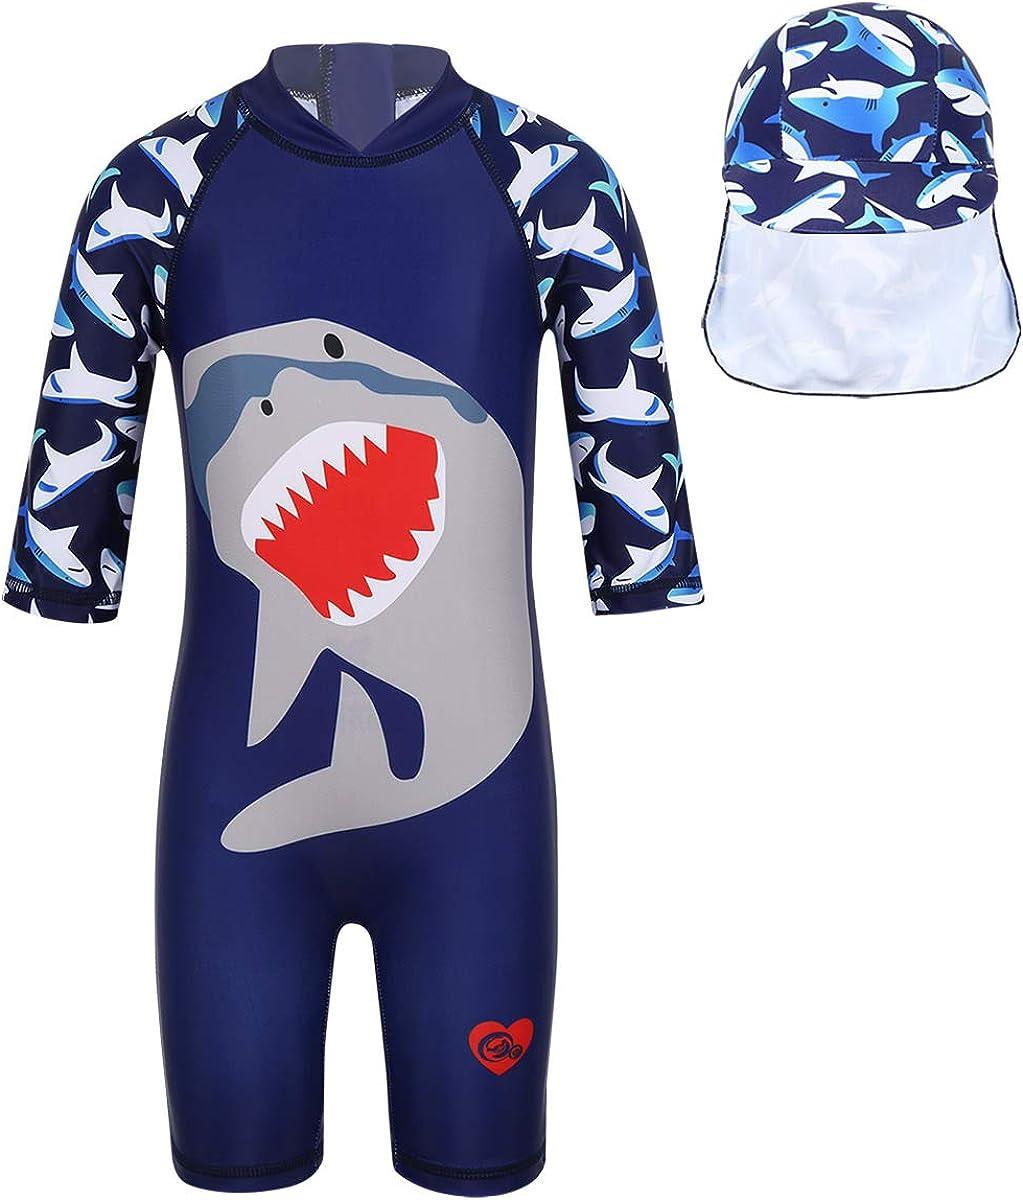 TiaoBug Baby Direct sale of manufacturer Boys Girls Short Rash Shirts One-Piece Sleeve Guard 5 ☆ popular